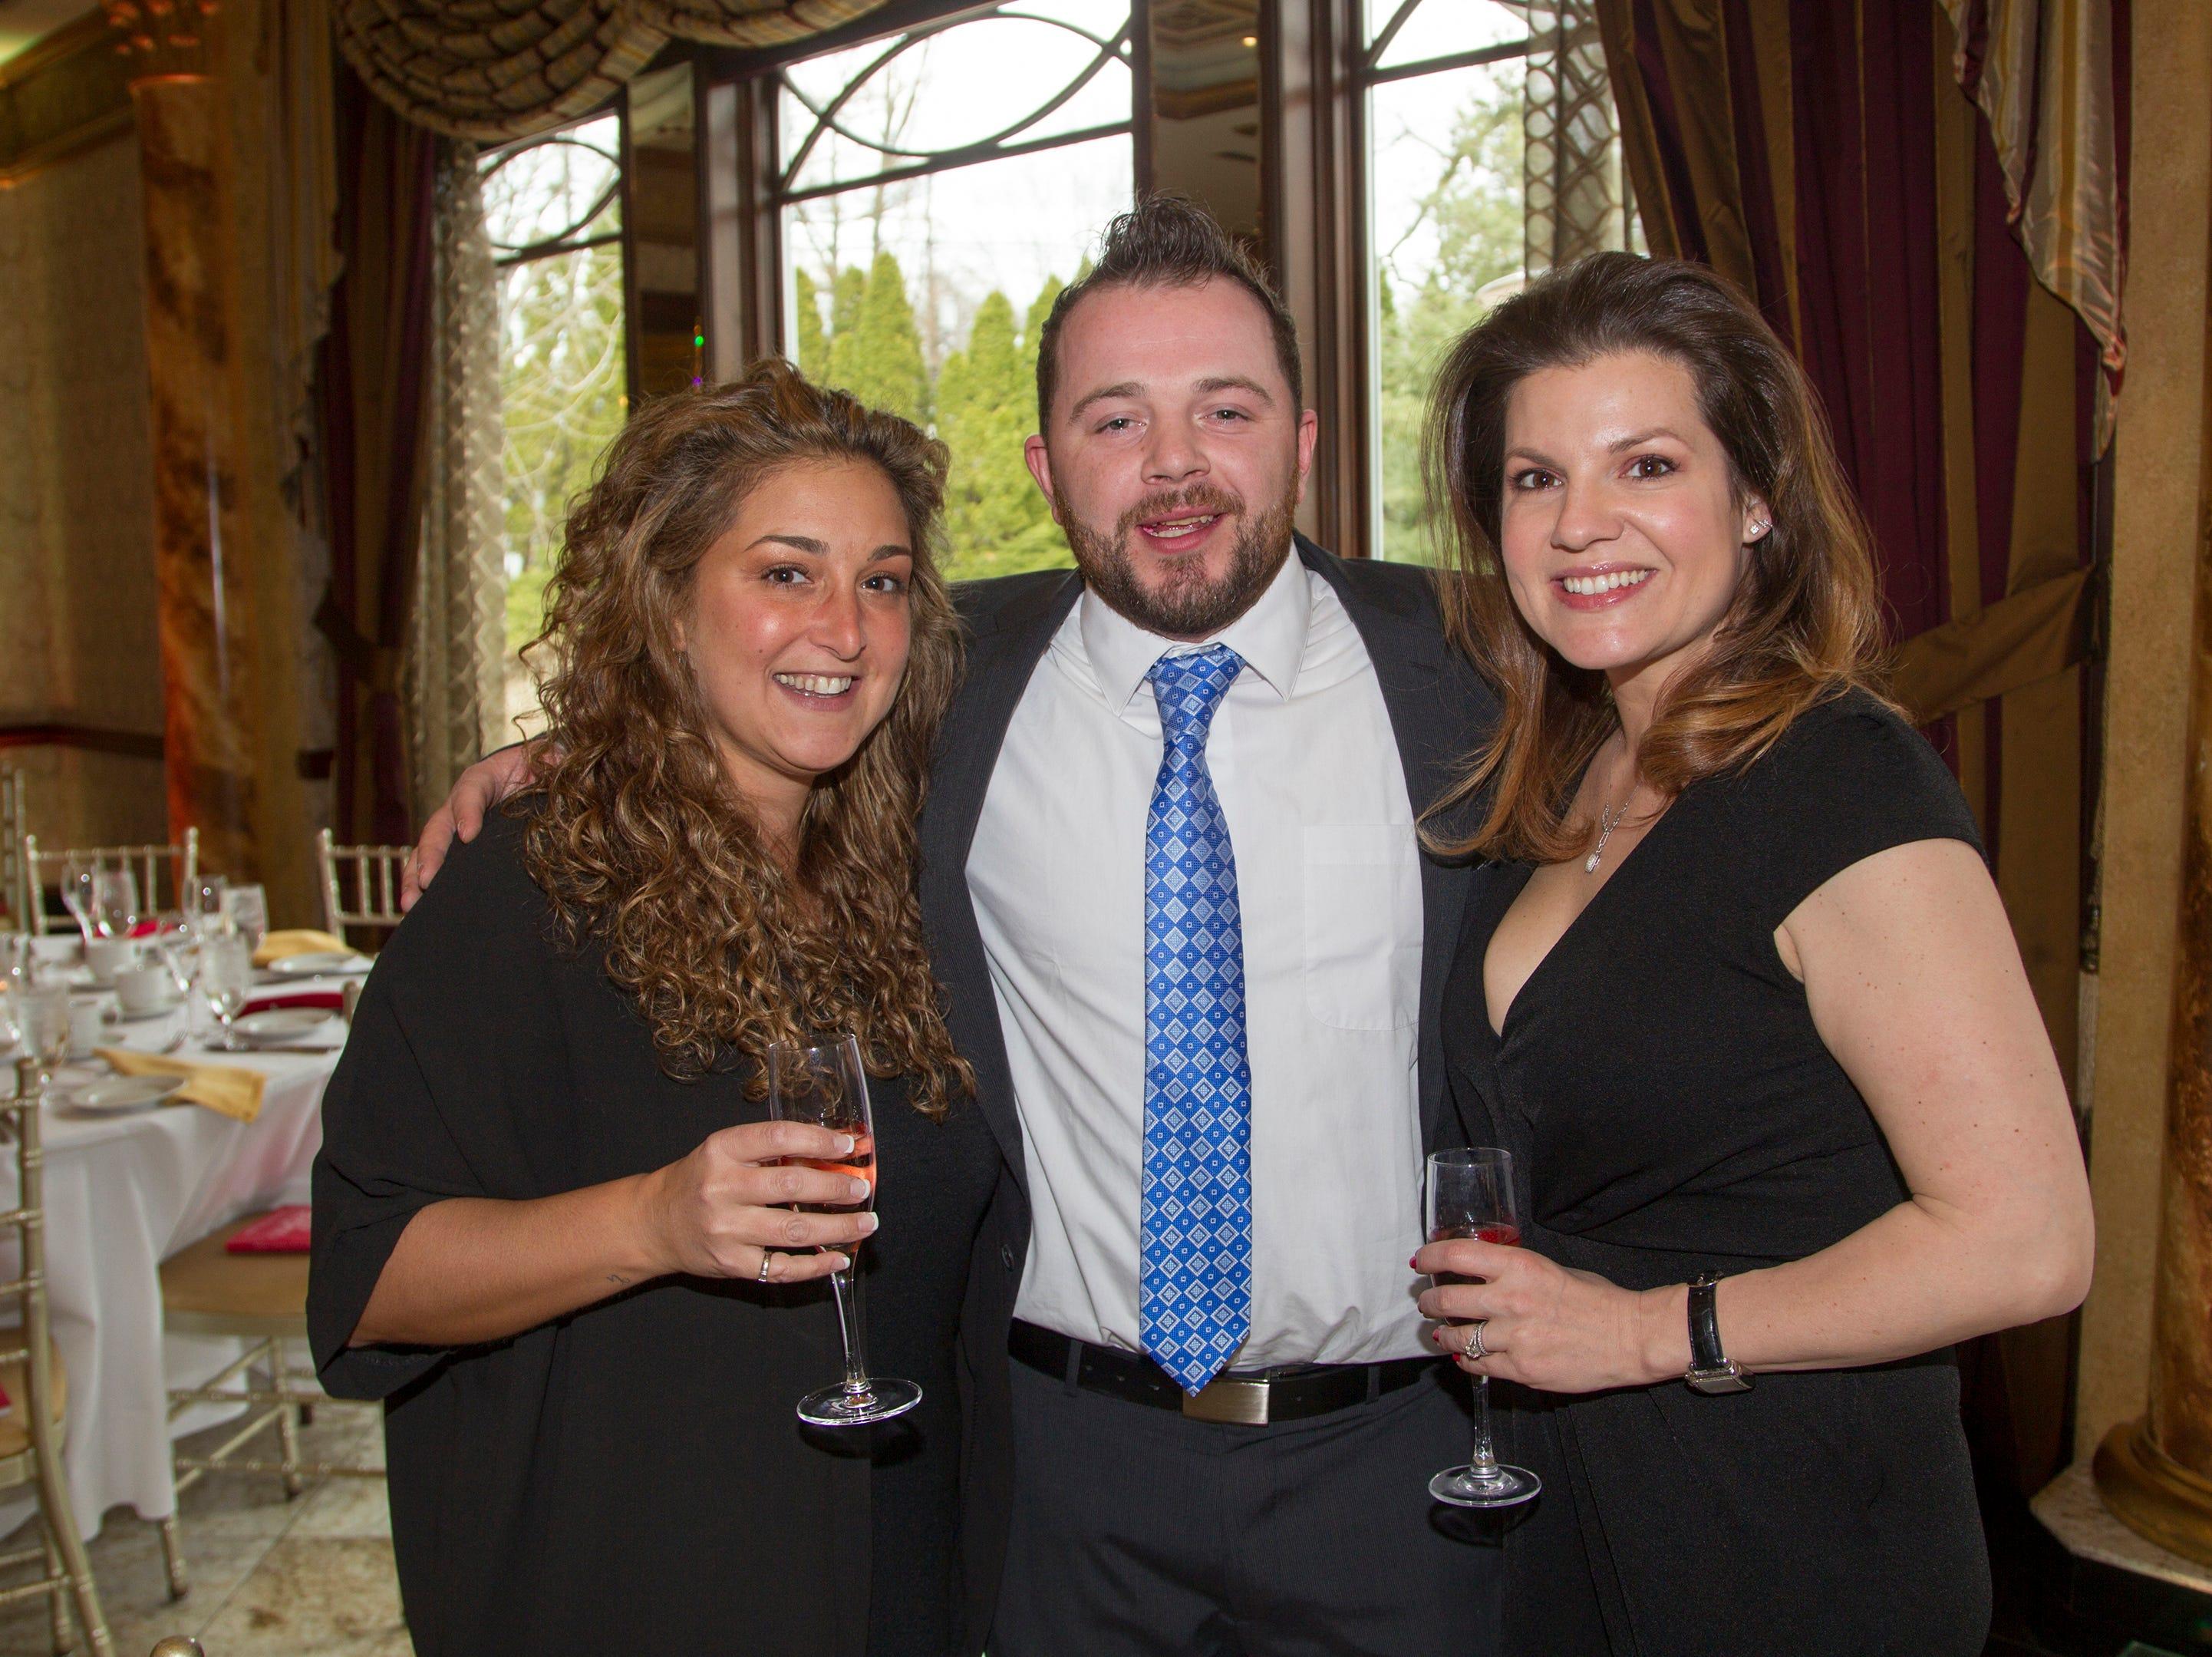 Kari Ventirini, David Falkenstern, Tara LaFontant. Bergen Catholic High School Hall of Fame Dinner at Seasons in Washington Twp. 03/31/2019